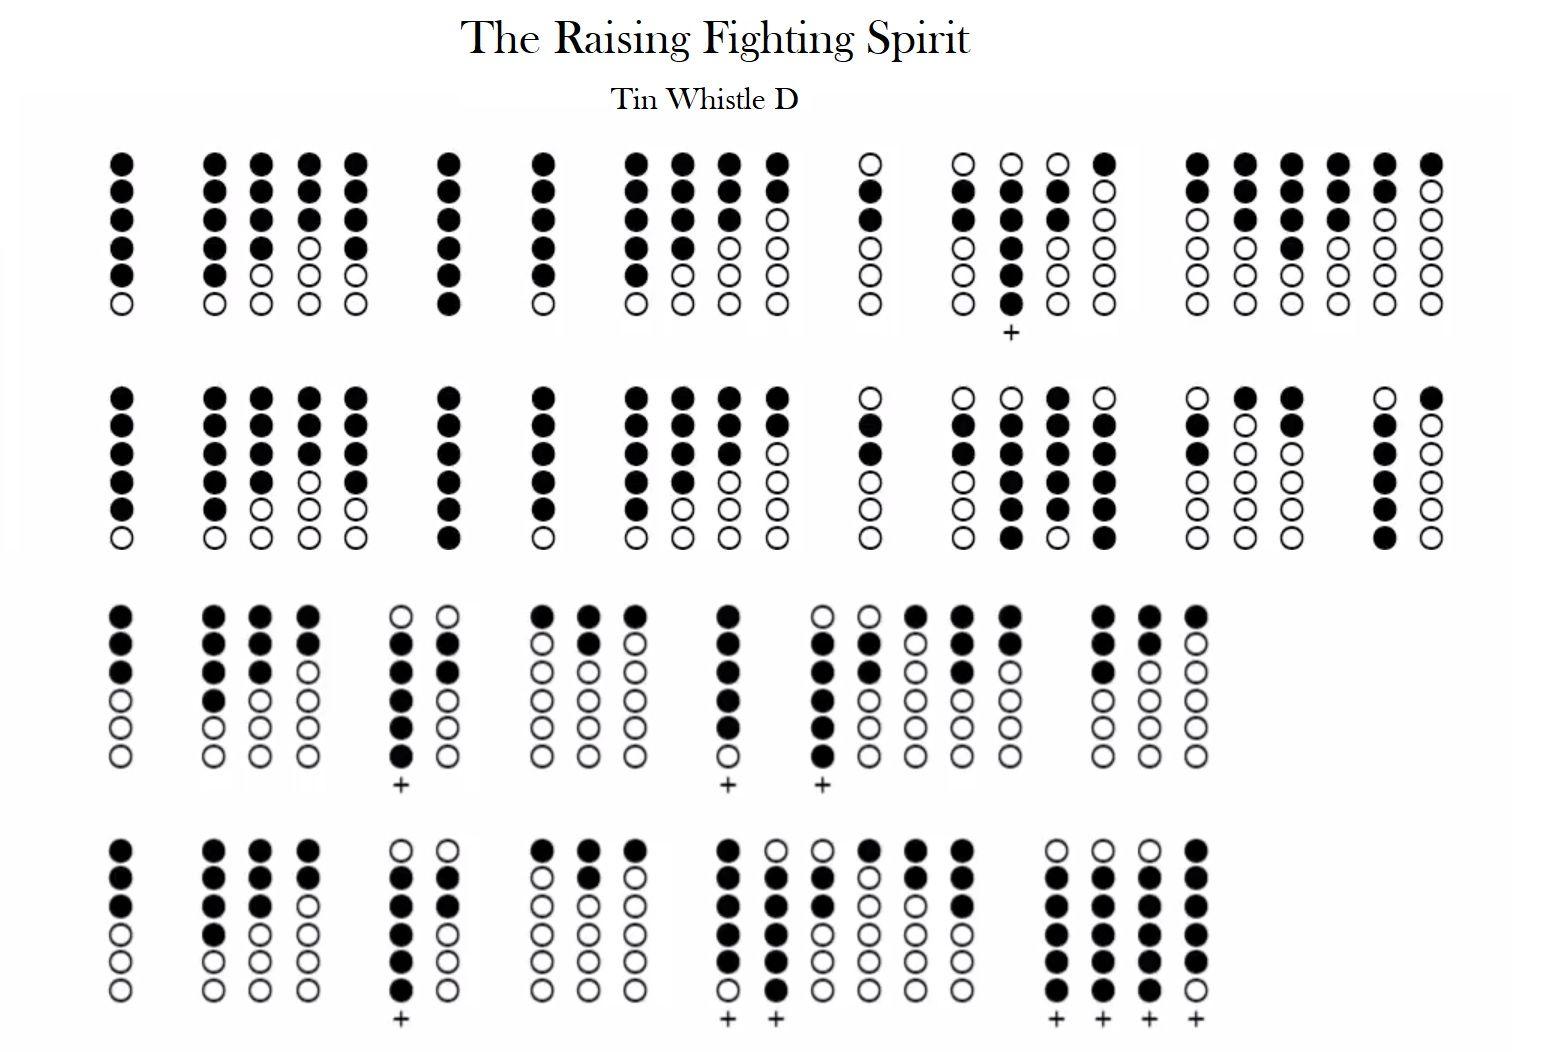 The Rising Fighting Spirit Naruto Tin Whistle D Tab